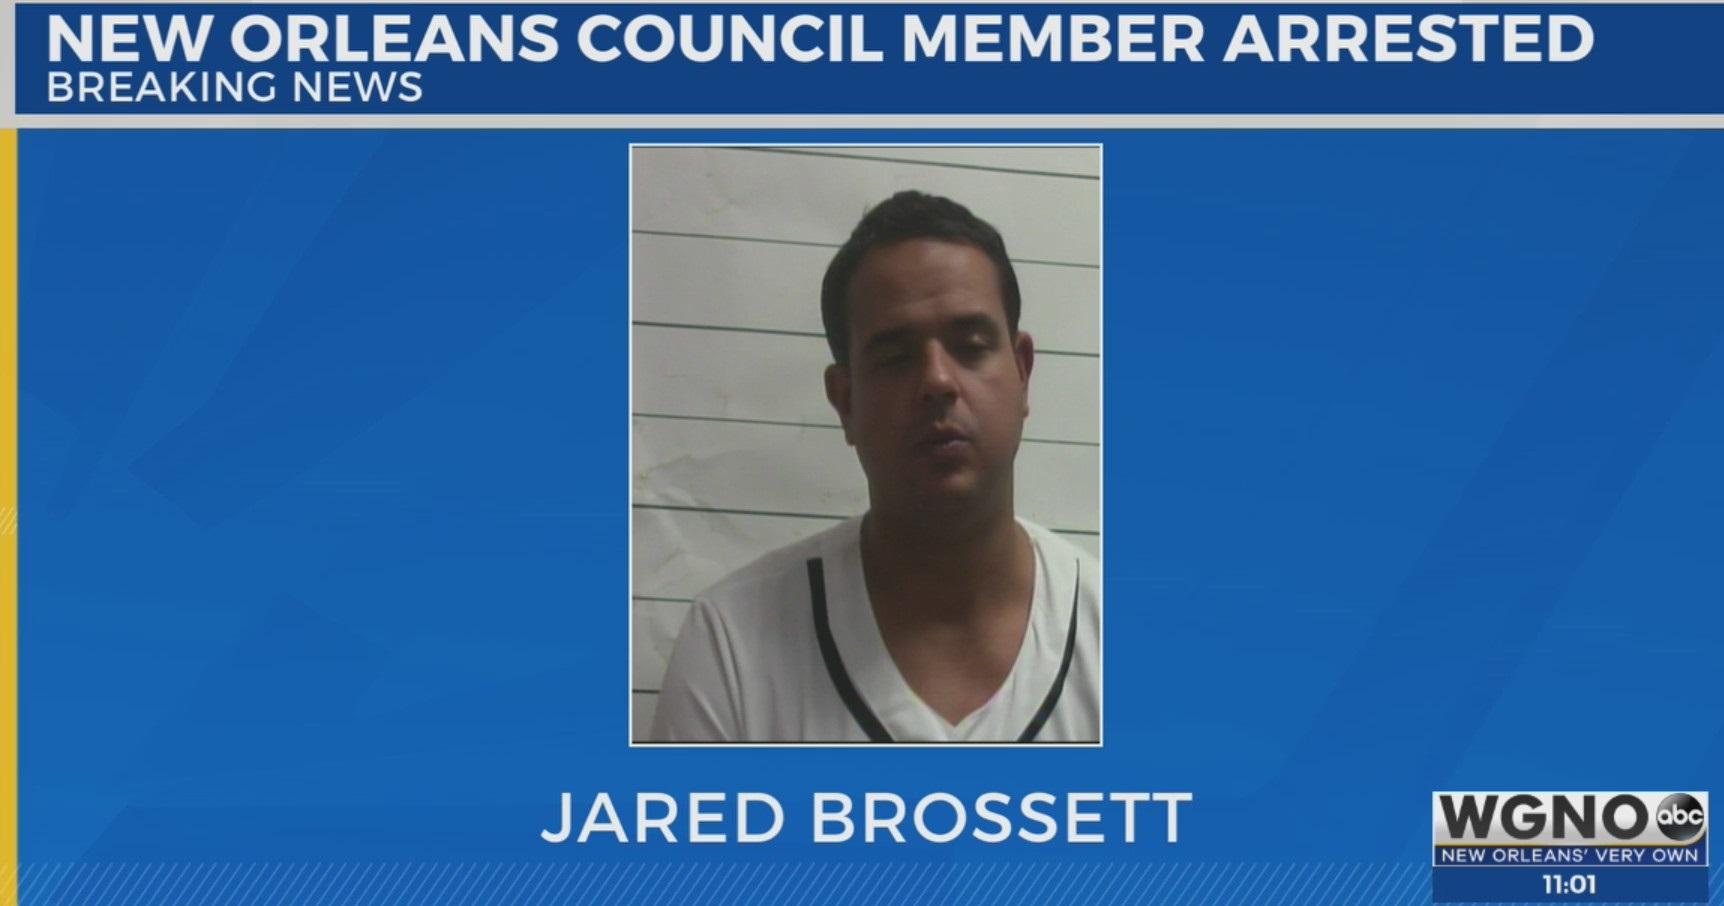 Councilman Jared Brossett arrested